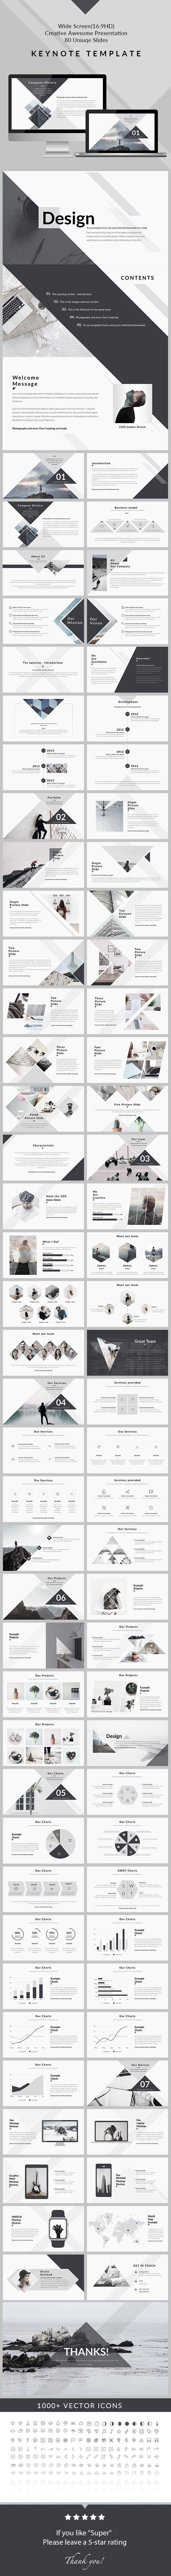 Design - Clean & Creative Keynote Template - Creative Keynote Templates #Infographics